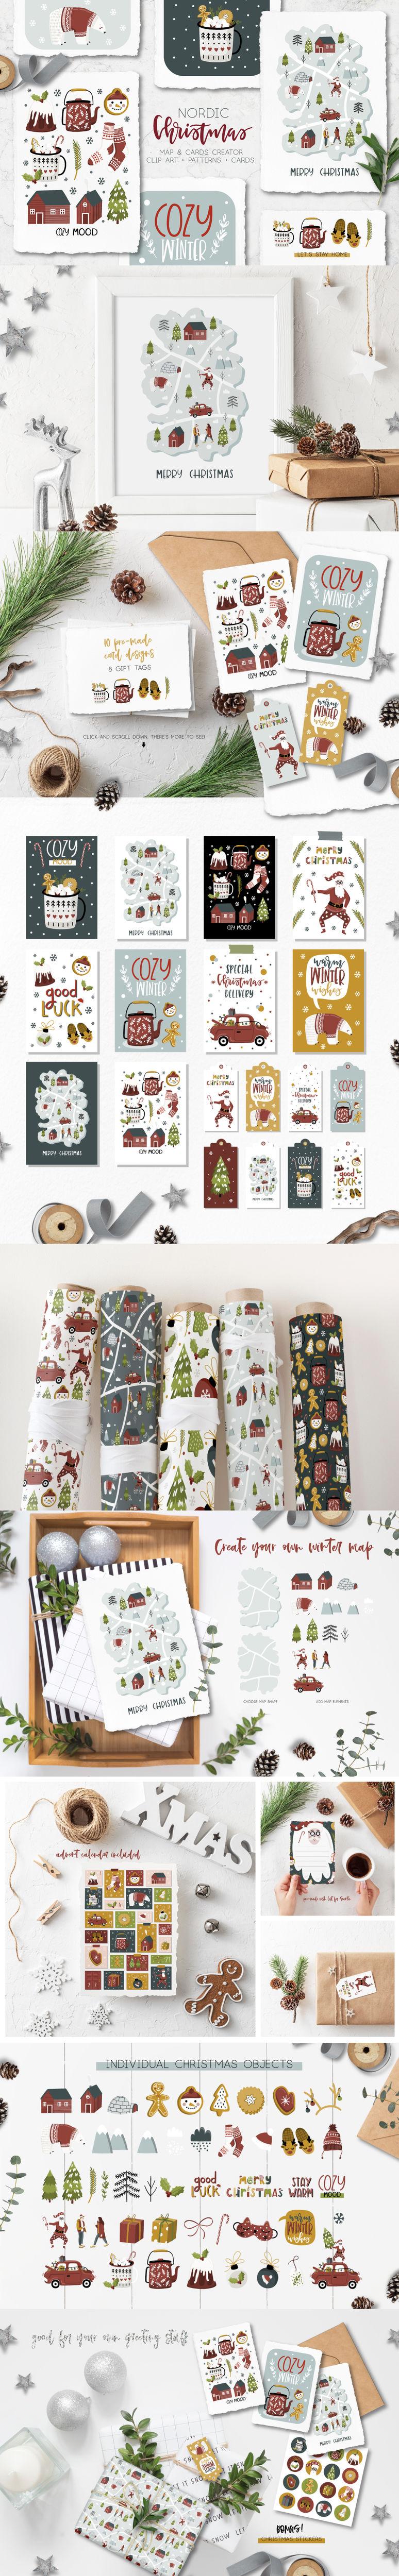 Nordic Christmas Map Creator By Lokko Studio Thehungryjpeg Com